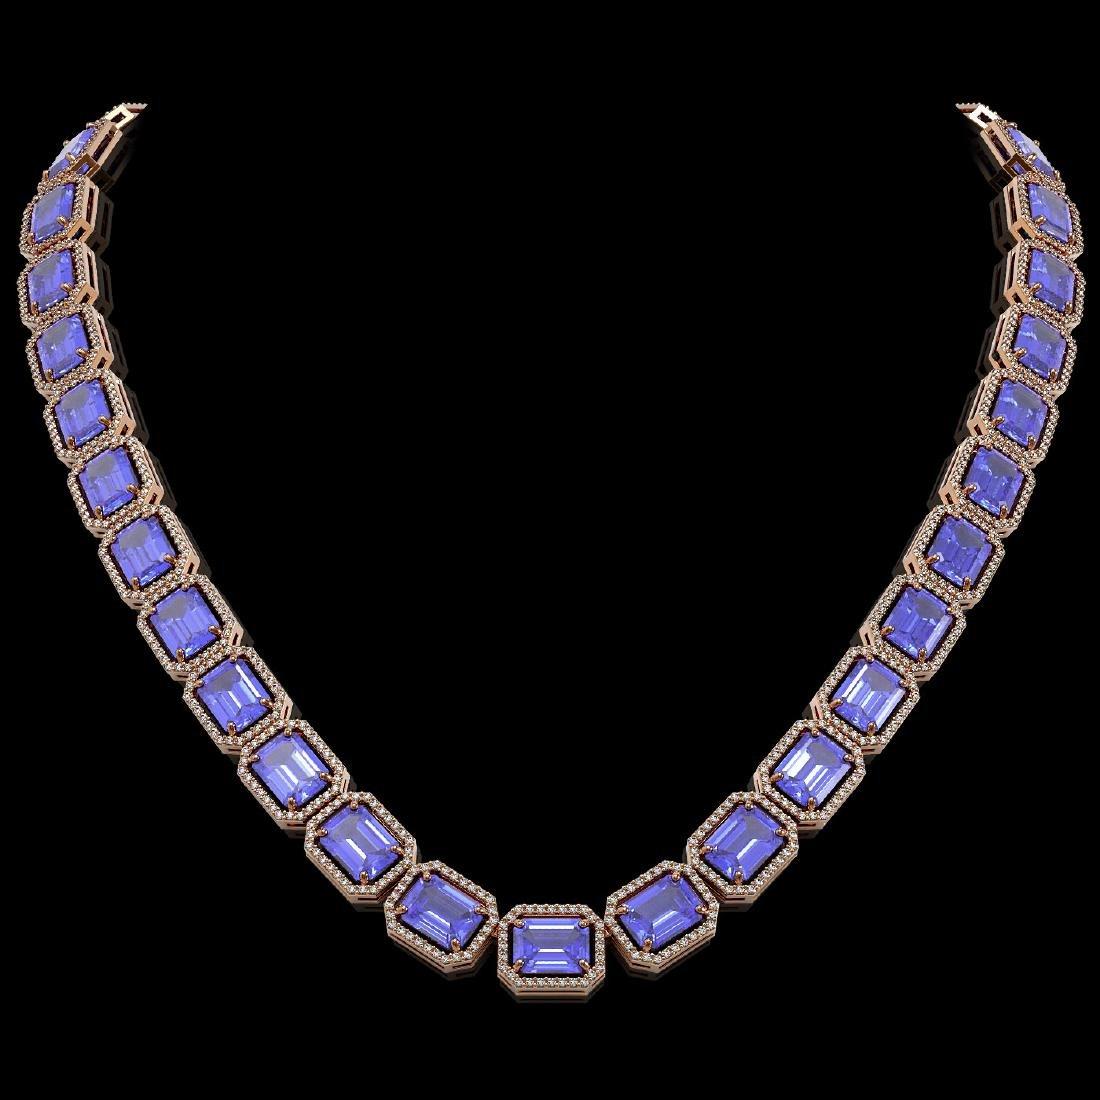 79.99 CTW Tanzanite & Diamond Halo Necklace 10K Rose